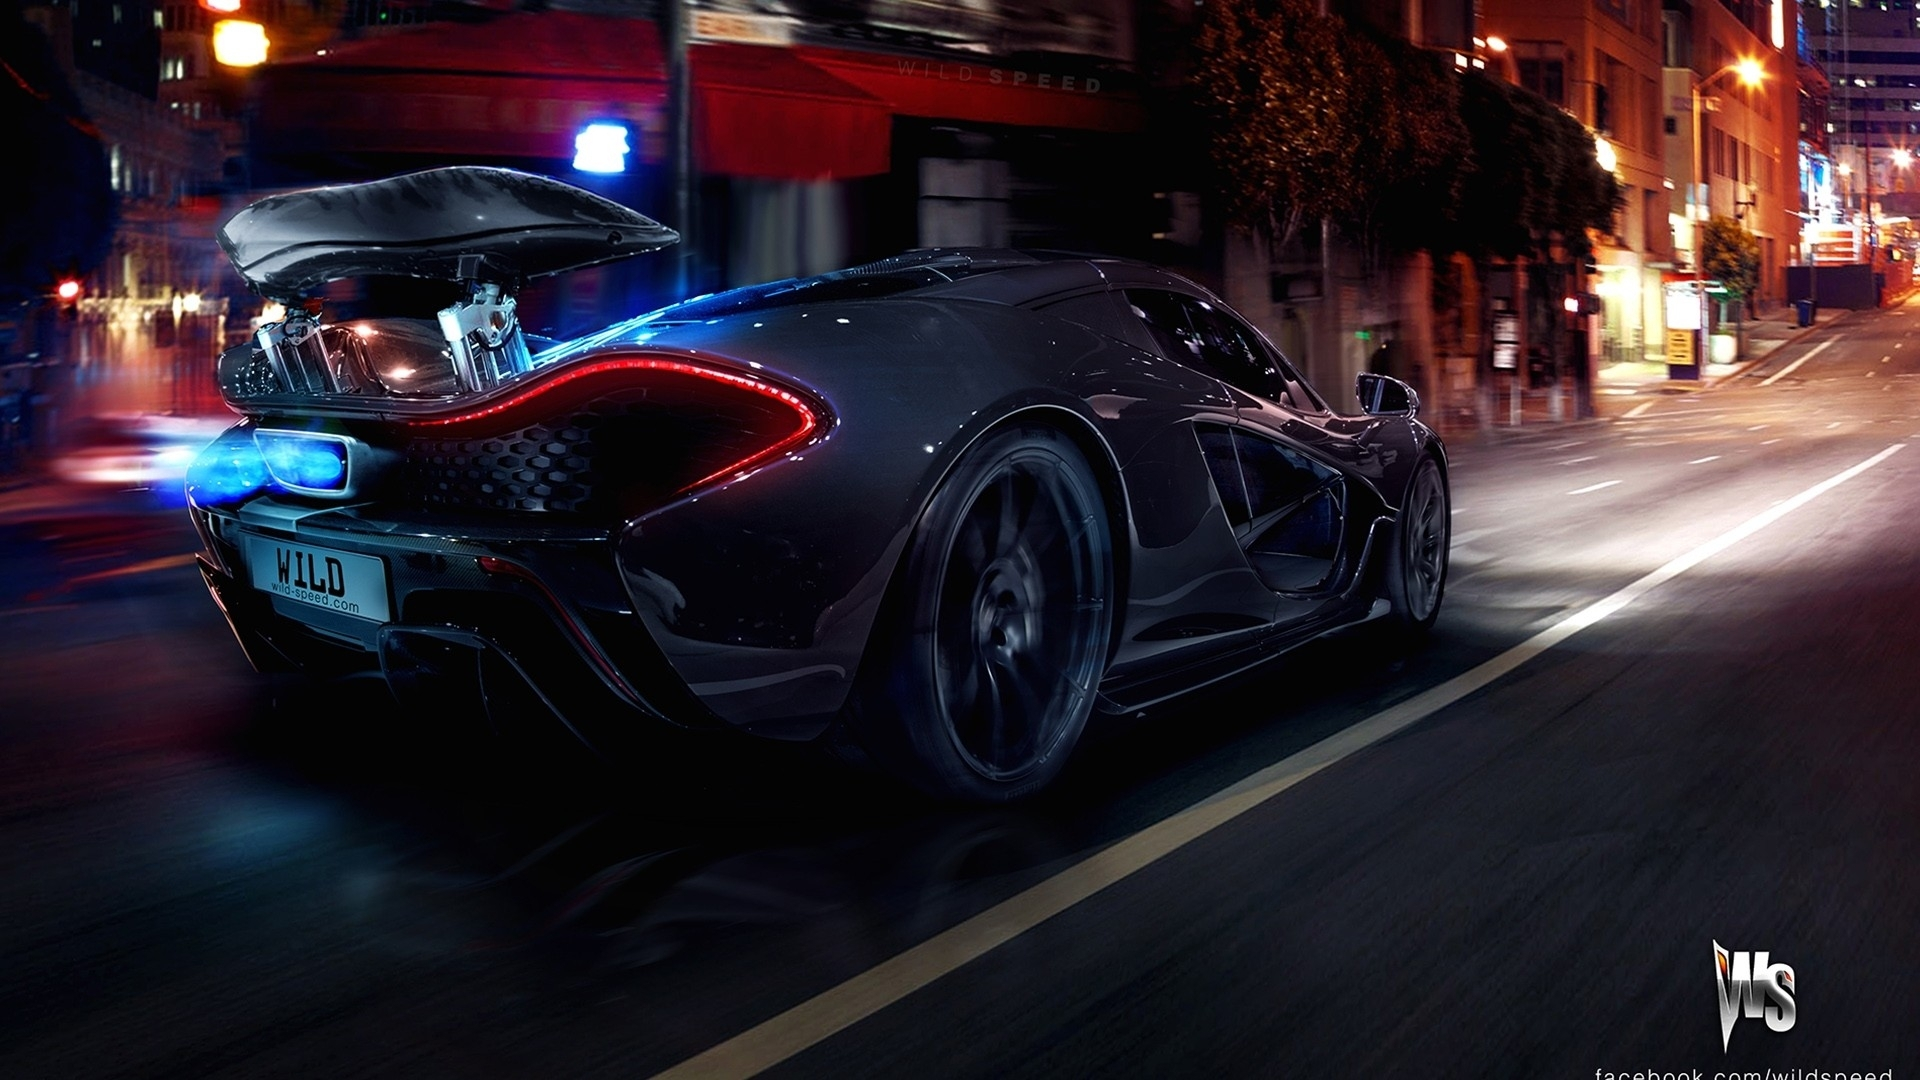 Imagenes De Autos Ultra Hd: McLaren P1 HD Wallpaper